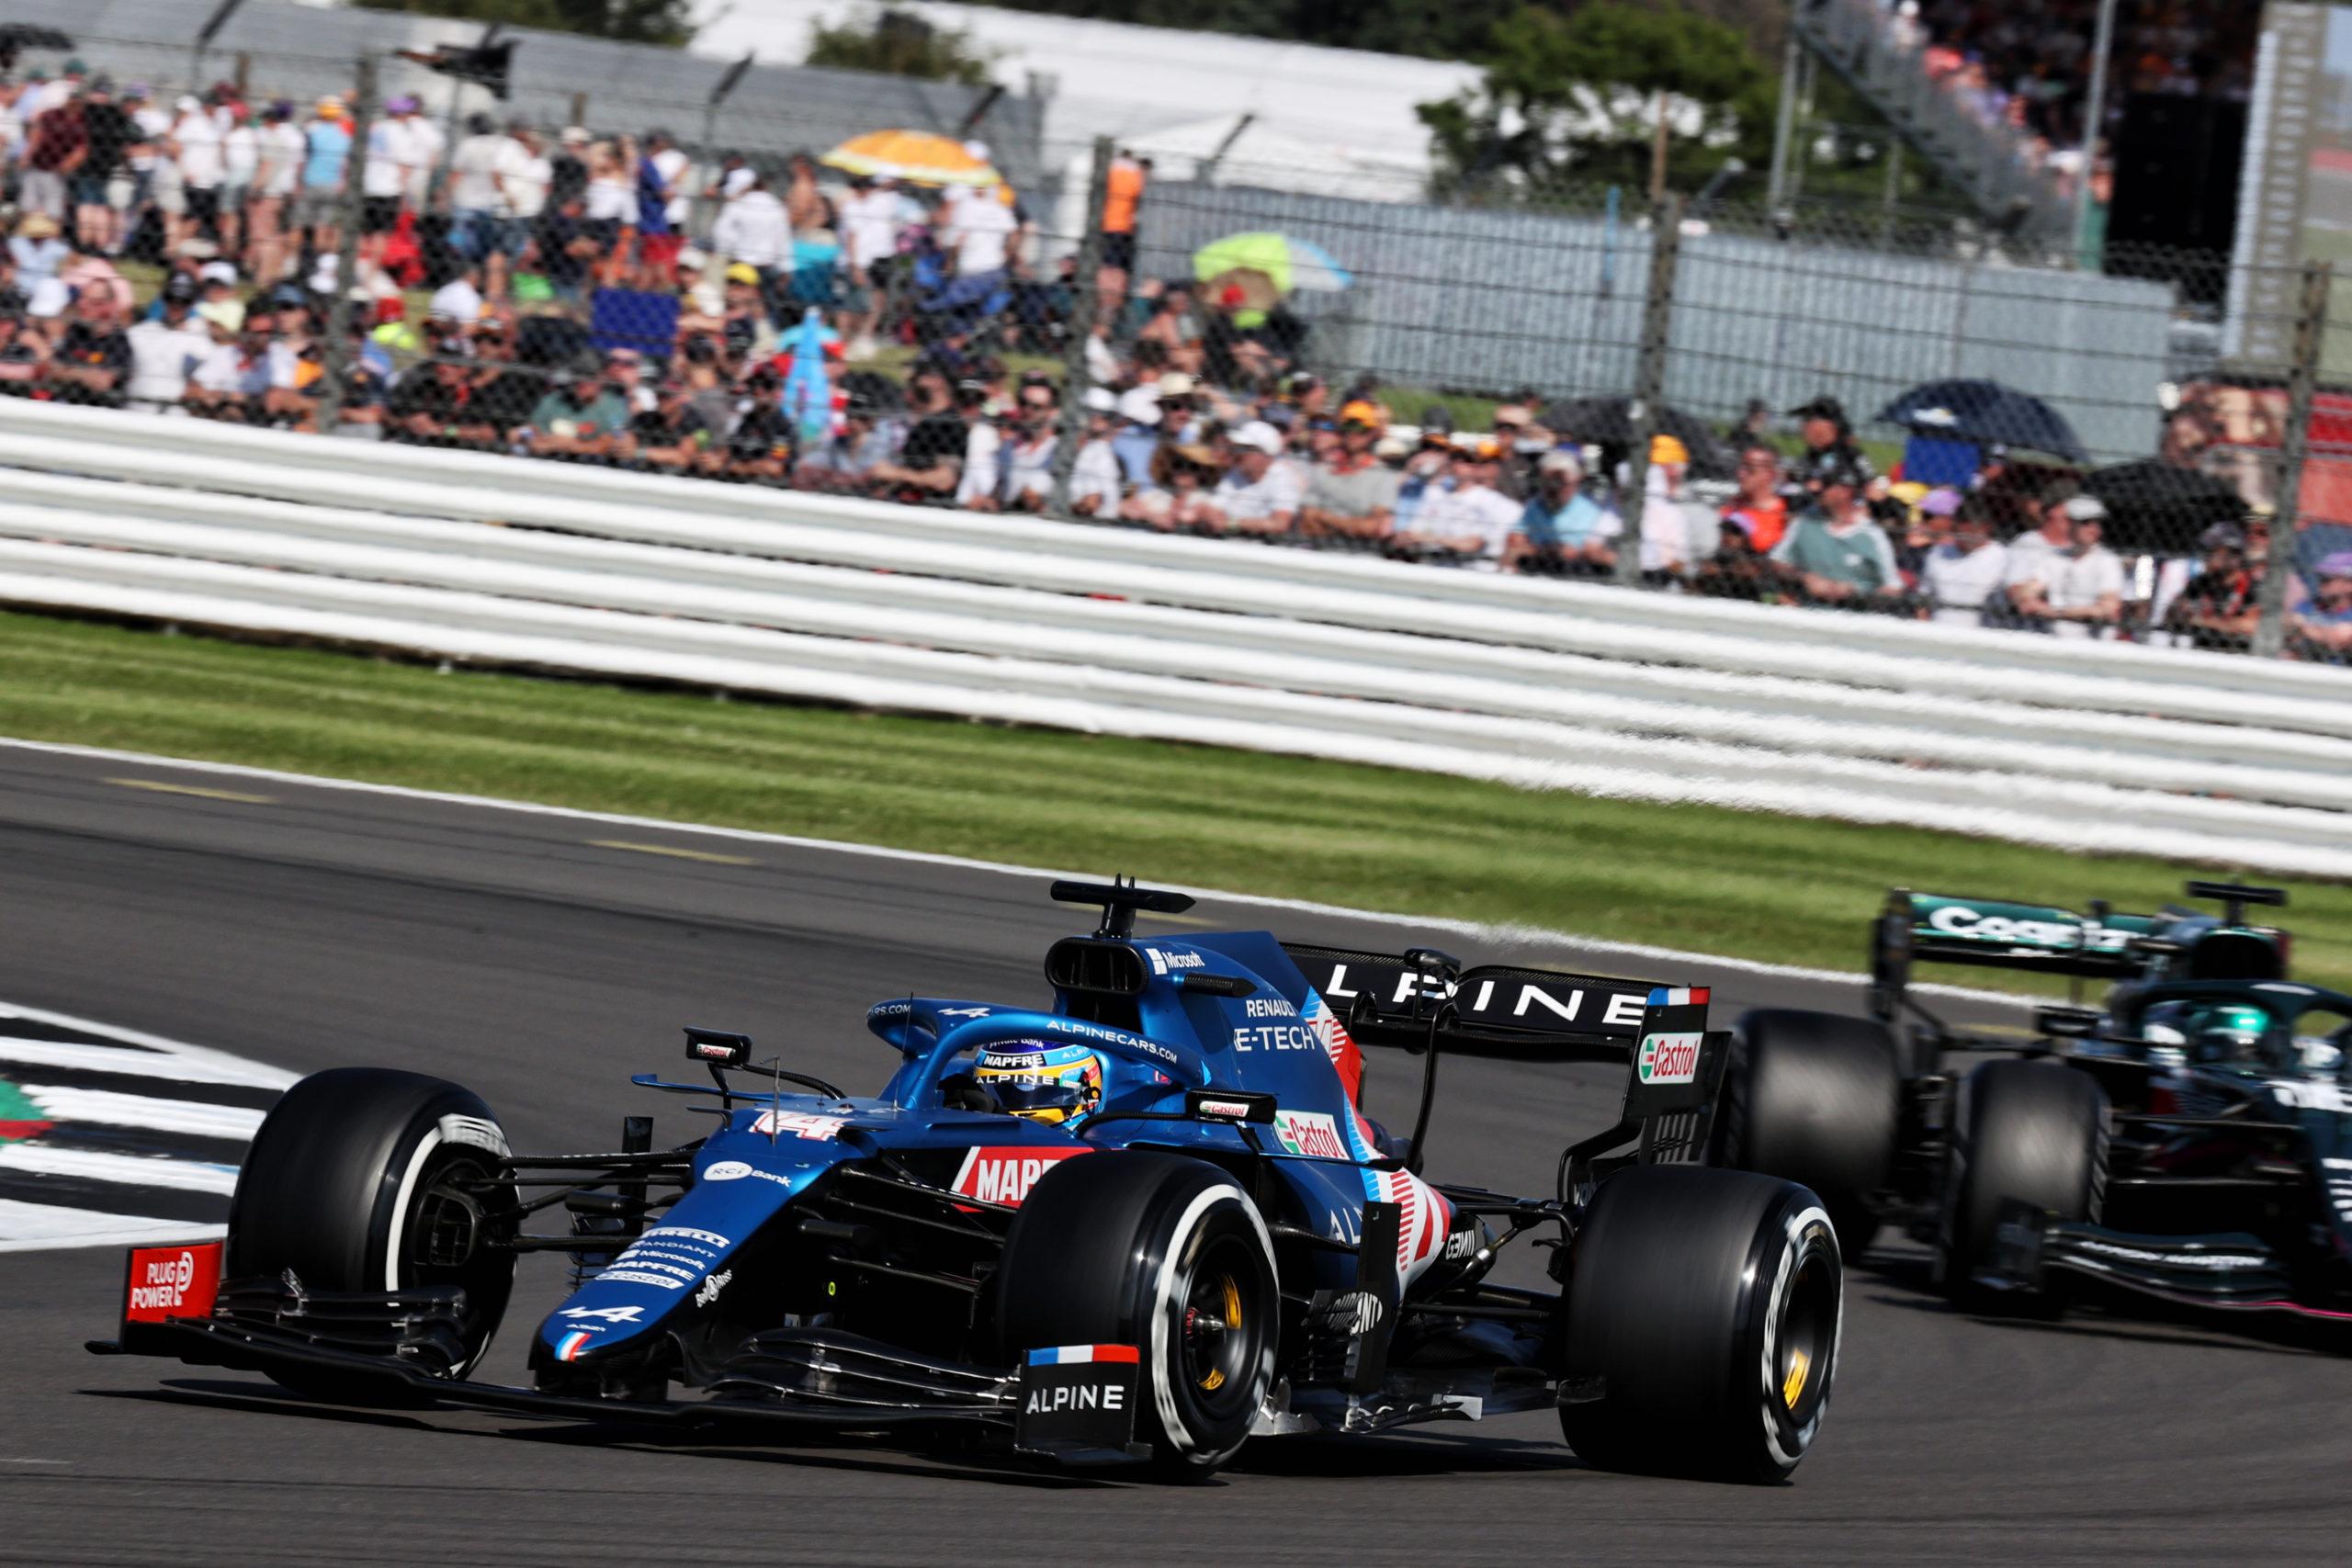 Fernando Alonso (ESP) Alpine F1 Team A521, F1 Grand Prix of Great Britain at Silverstone on July 18, 2021 in Northampton, England.